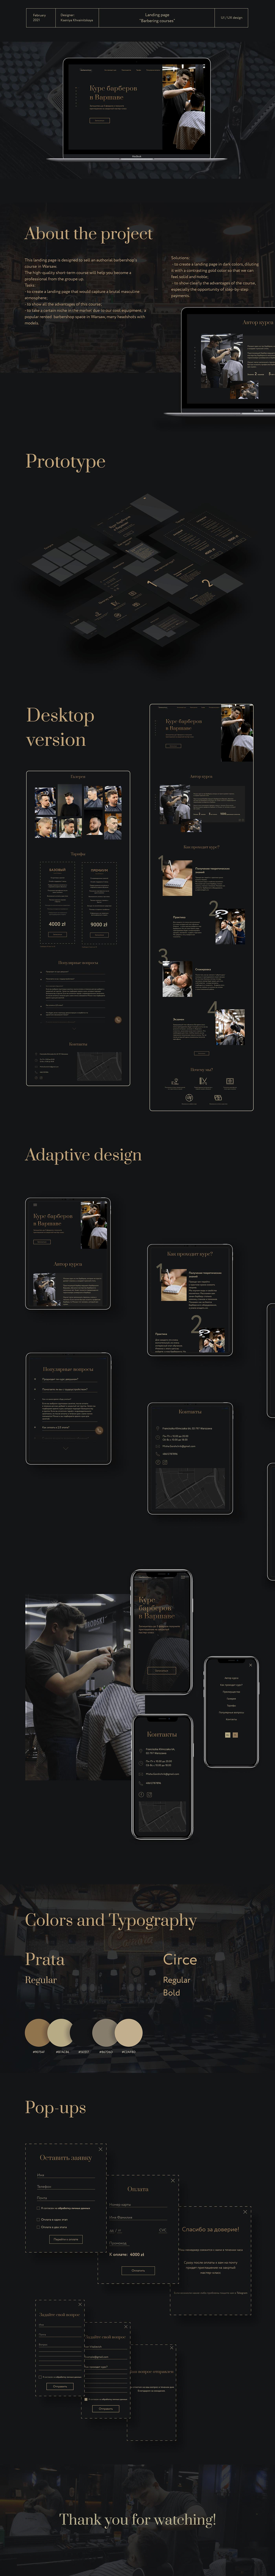 adaptive design barbering courses design Figma landing page UI ux